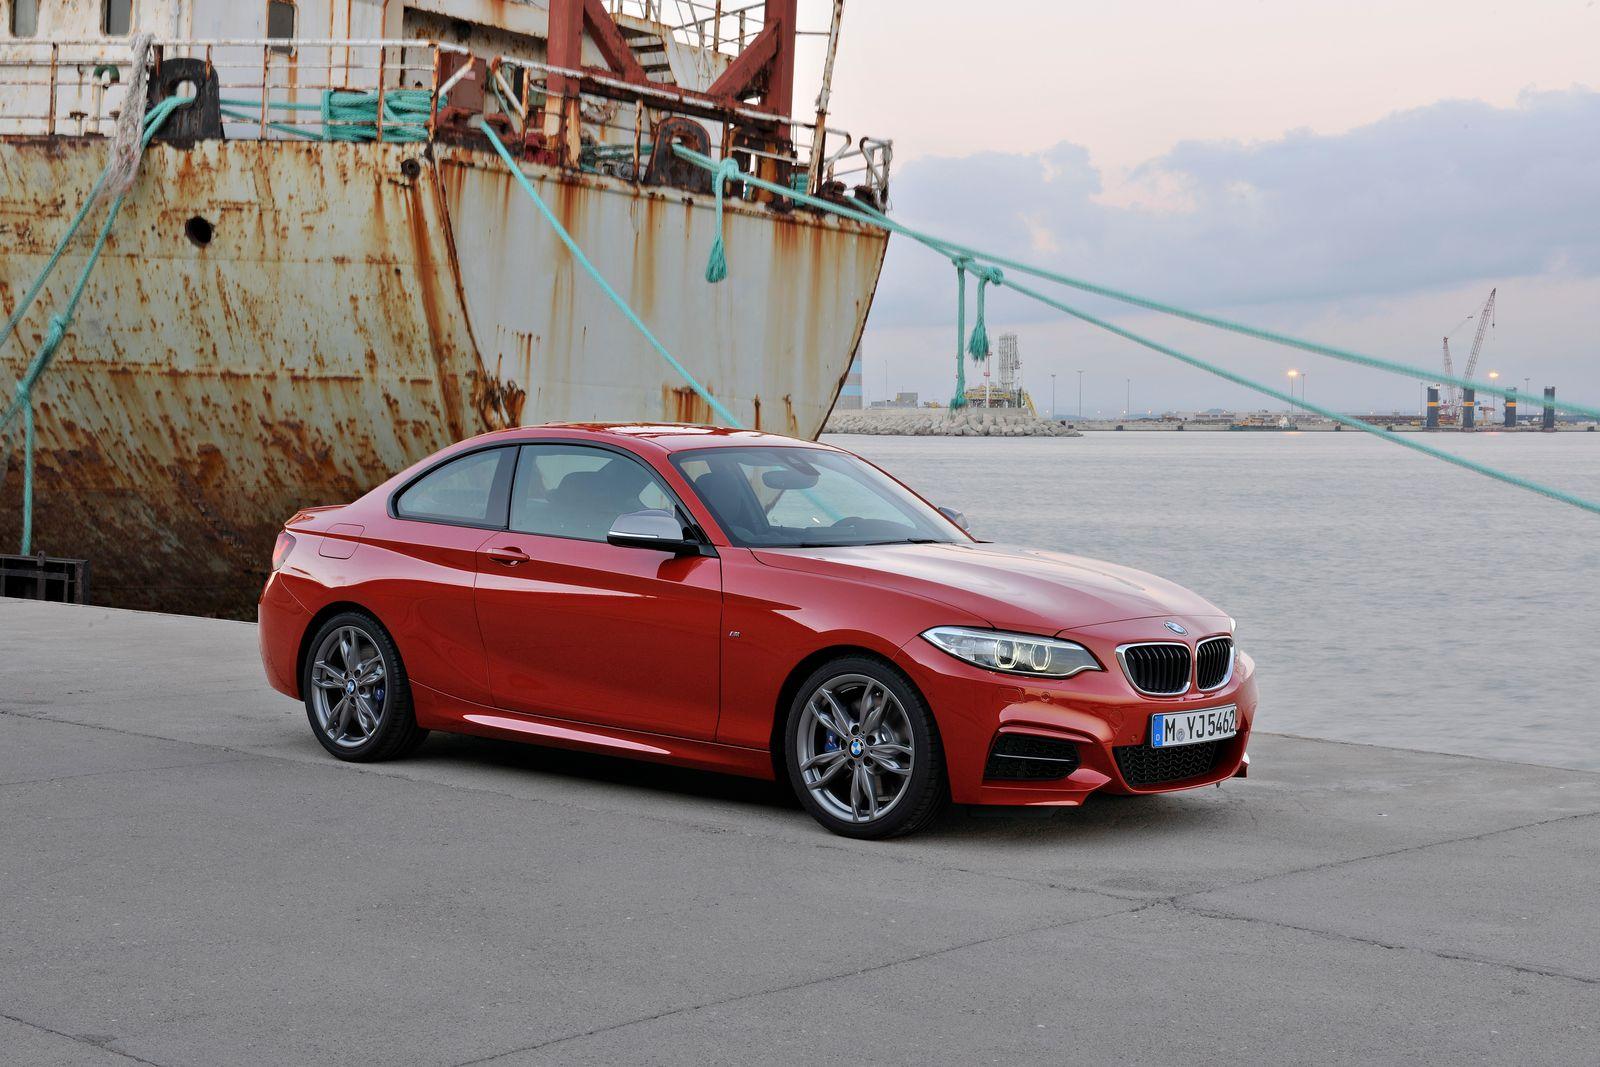 BMW 2er / SPERRFRIST, Freitag, 25.10.2013, 0.01 Uhr